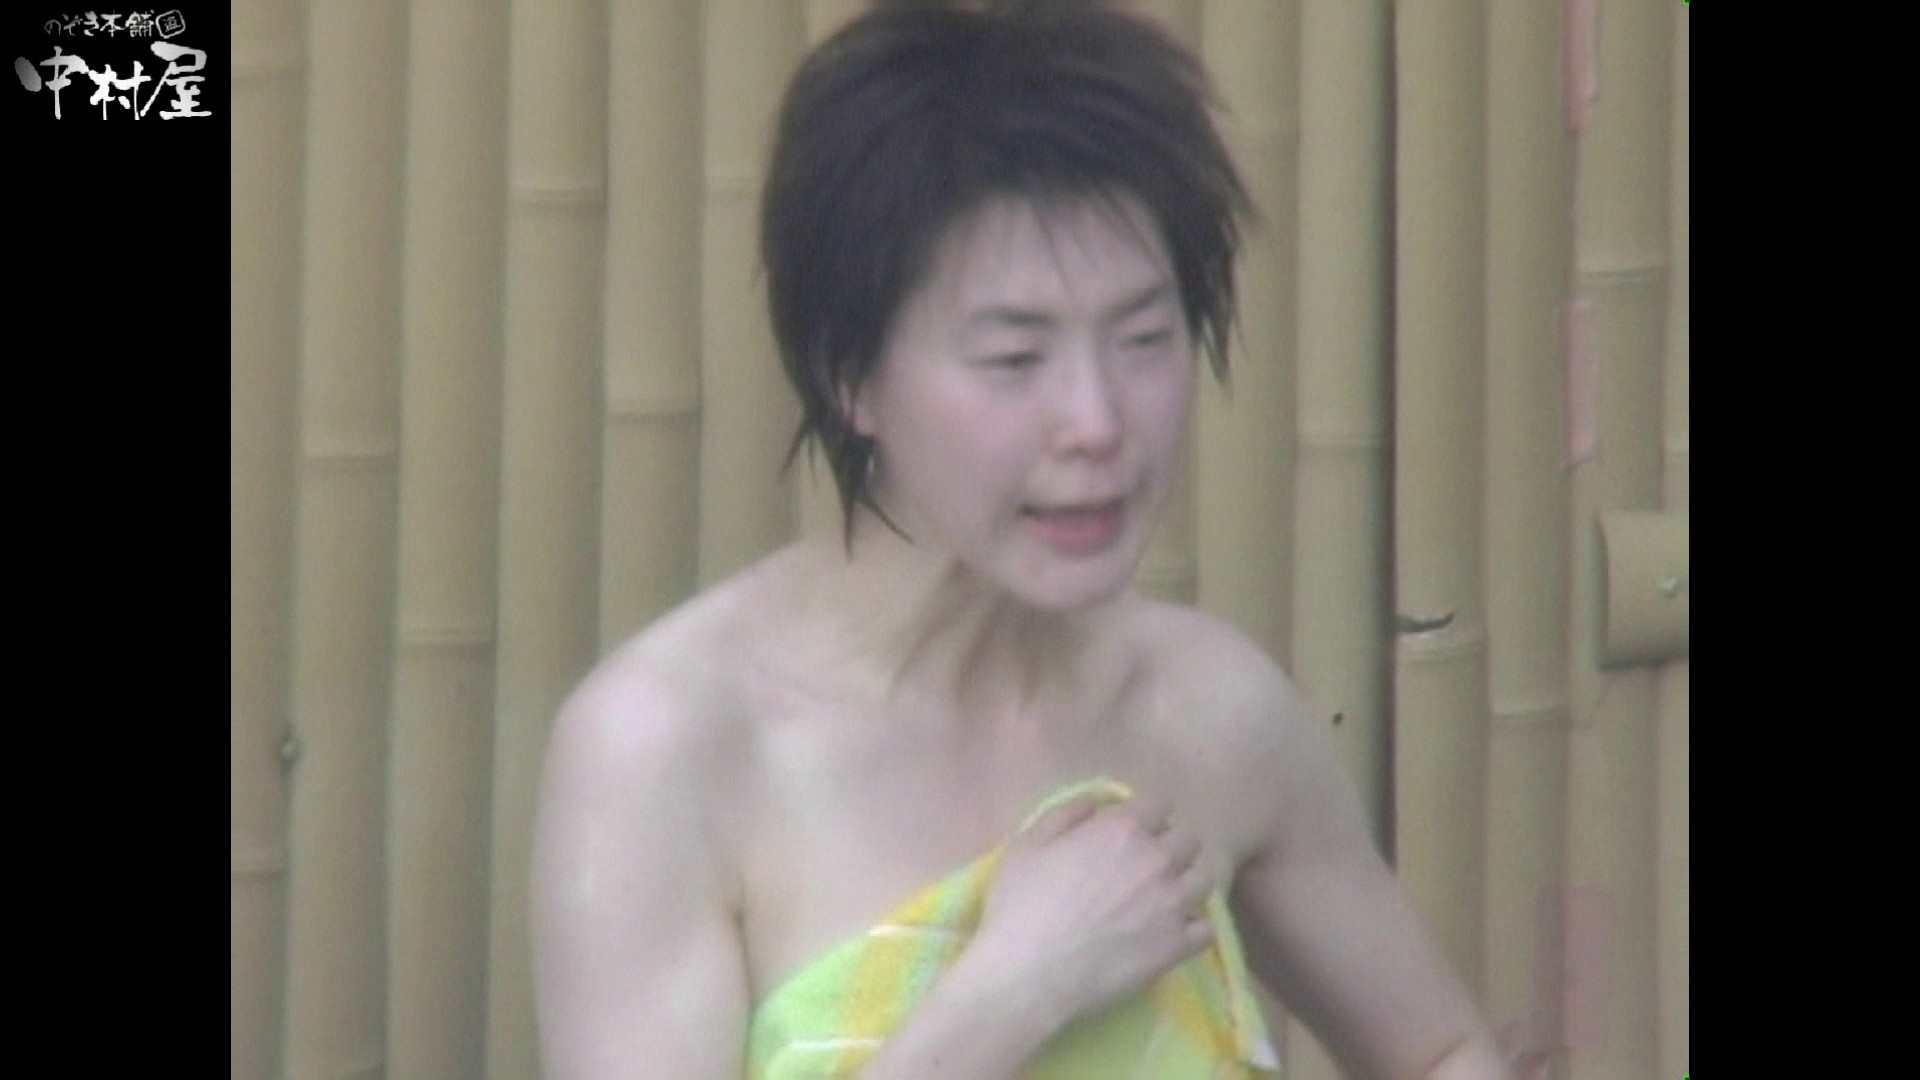 Aquaな露天風呂Vol.938 0 | エッチな盗撮  111pic 93